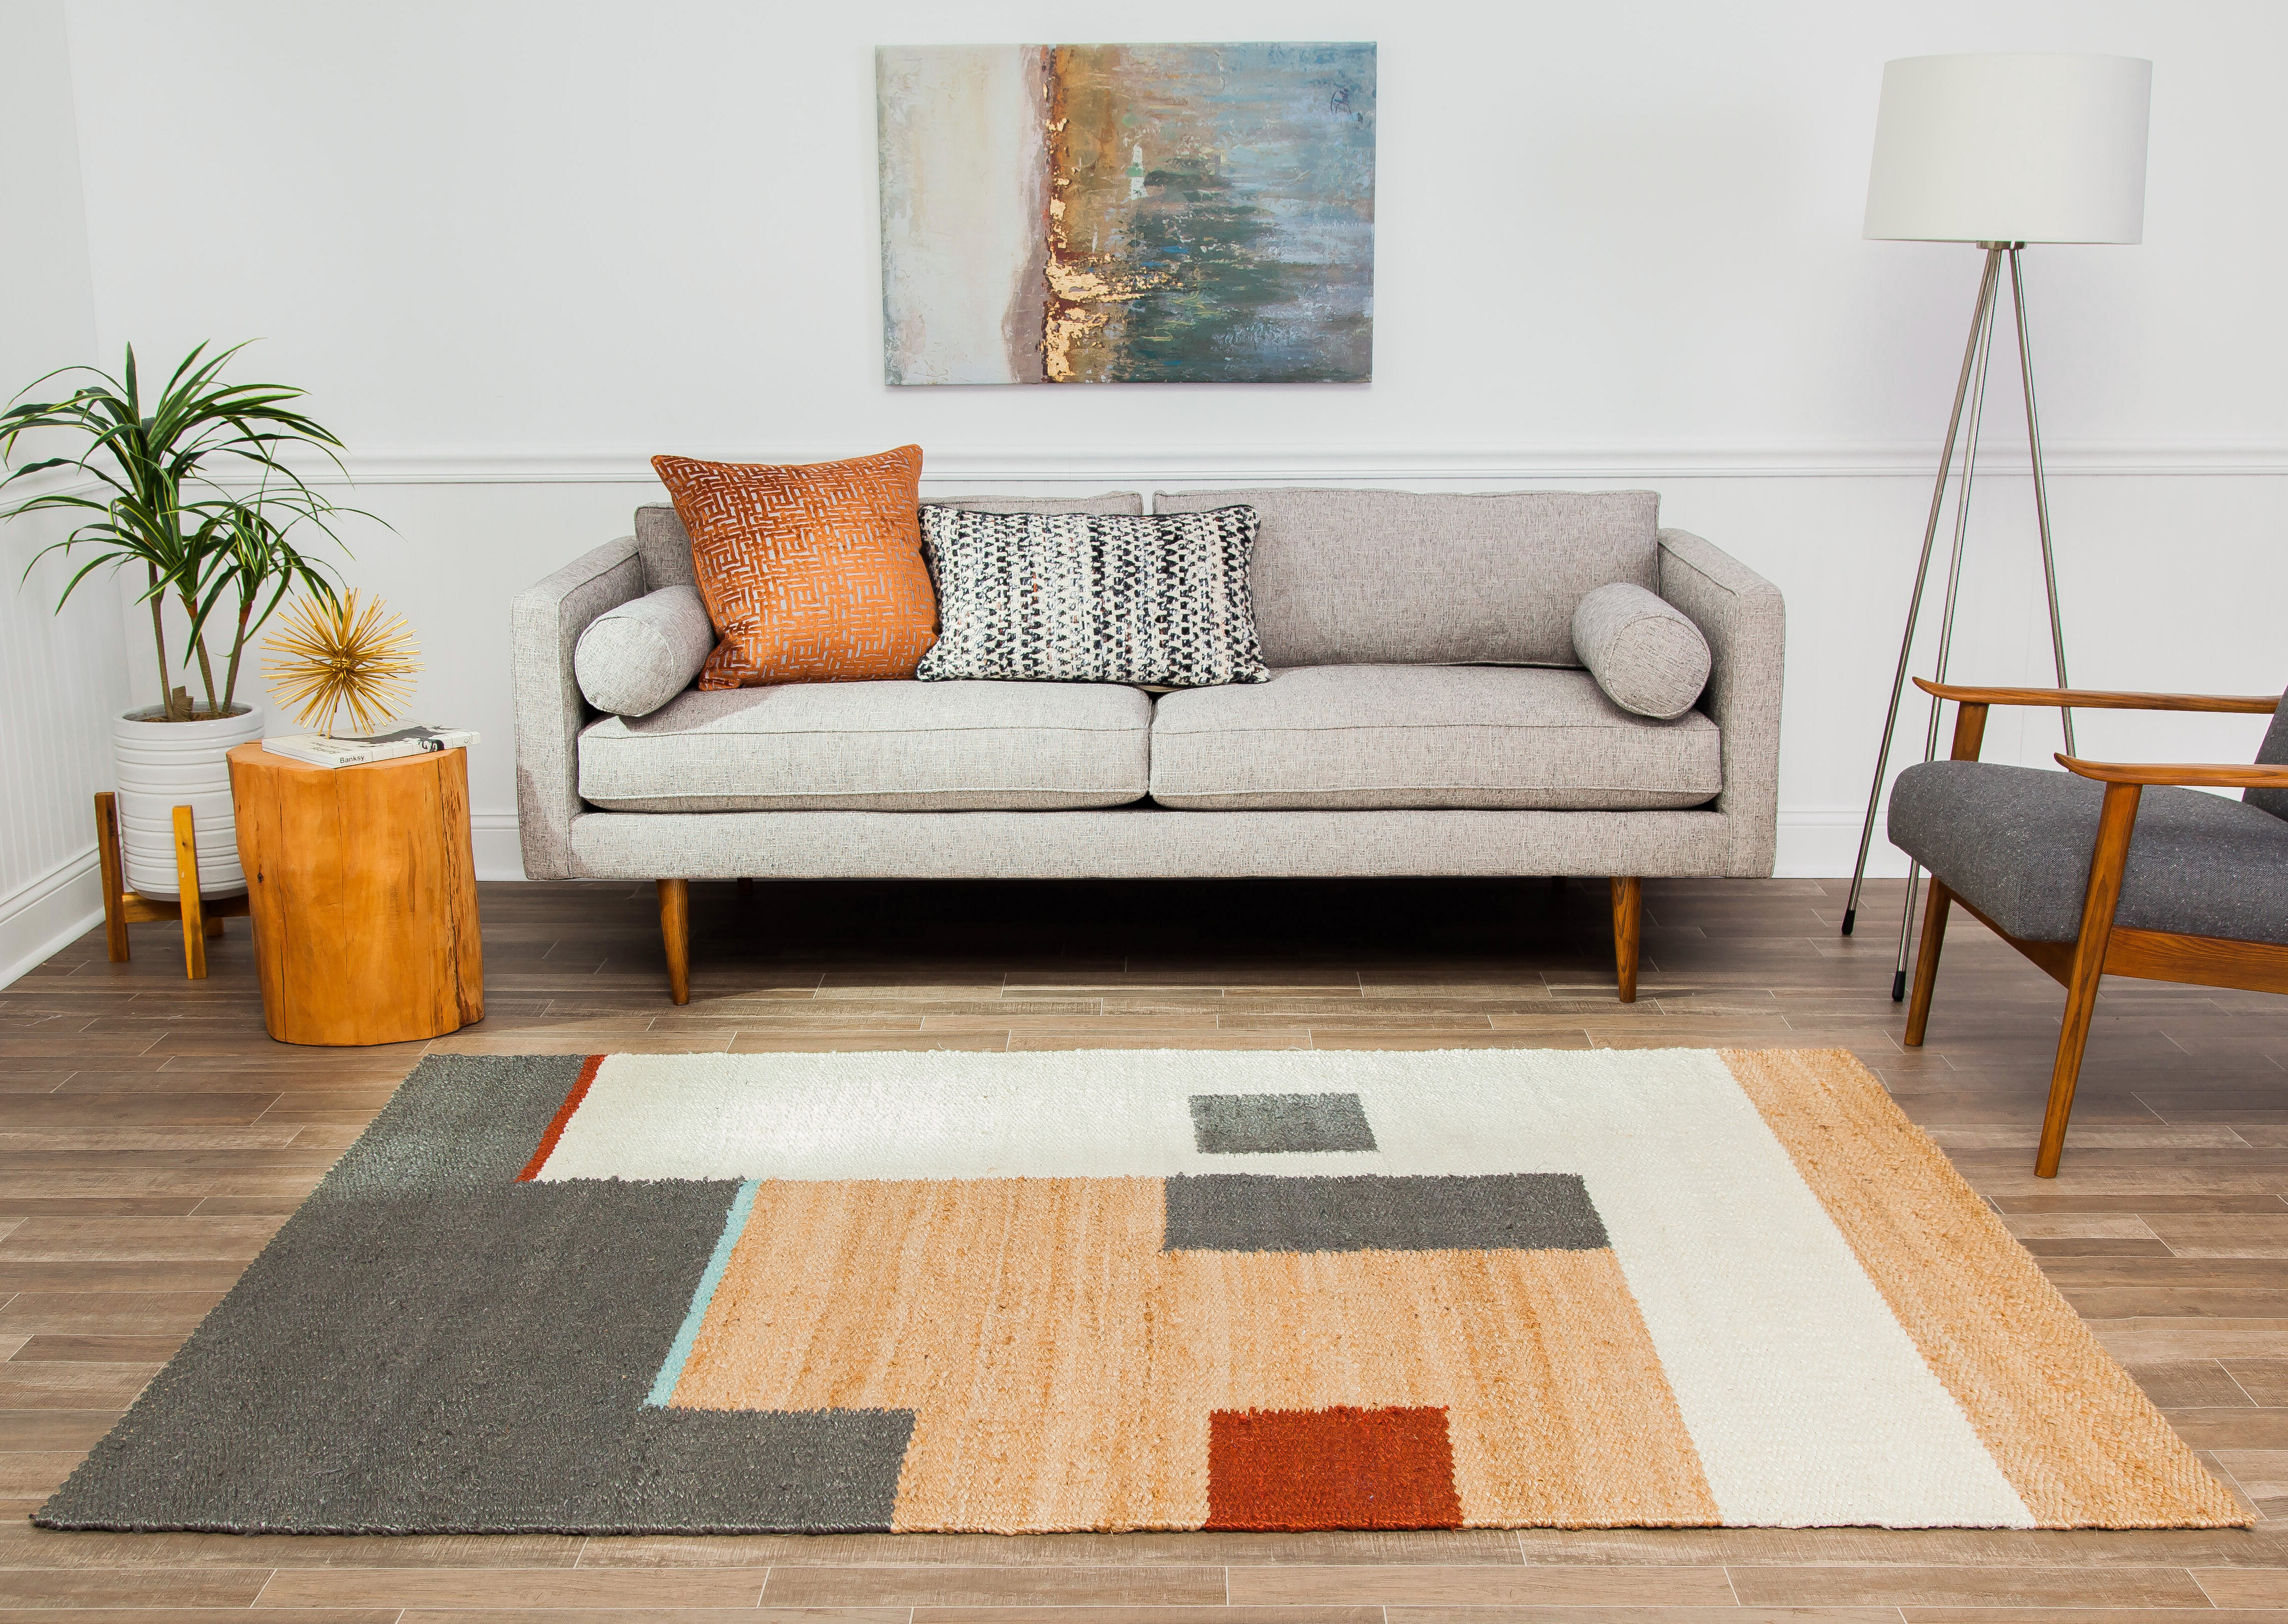 Geometric Handwoven Jute Sisal Tan Black Gray Area Rug Reviews Allmodern